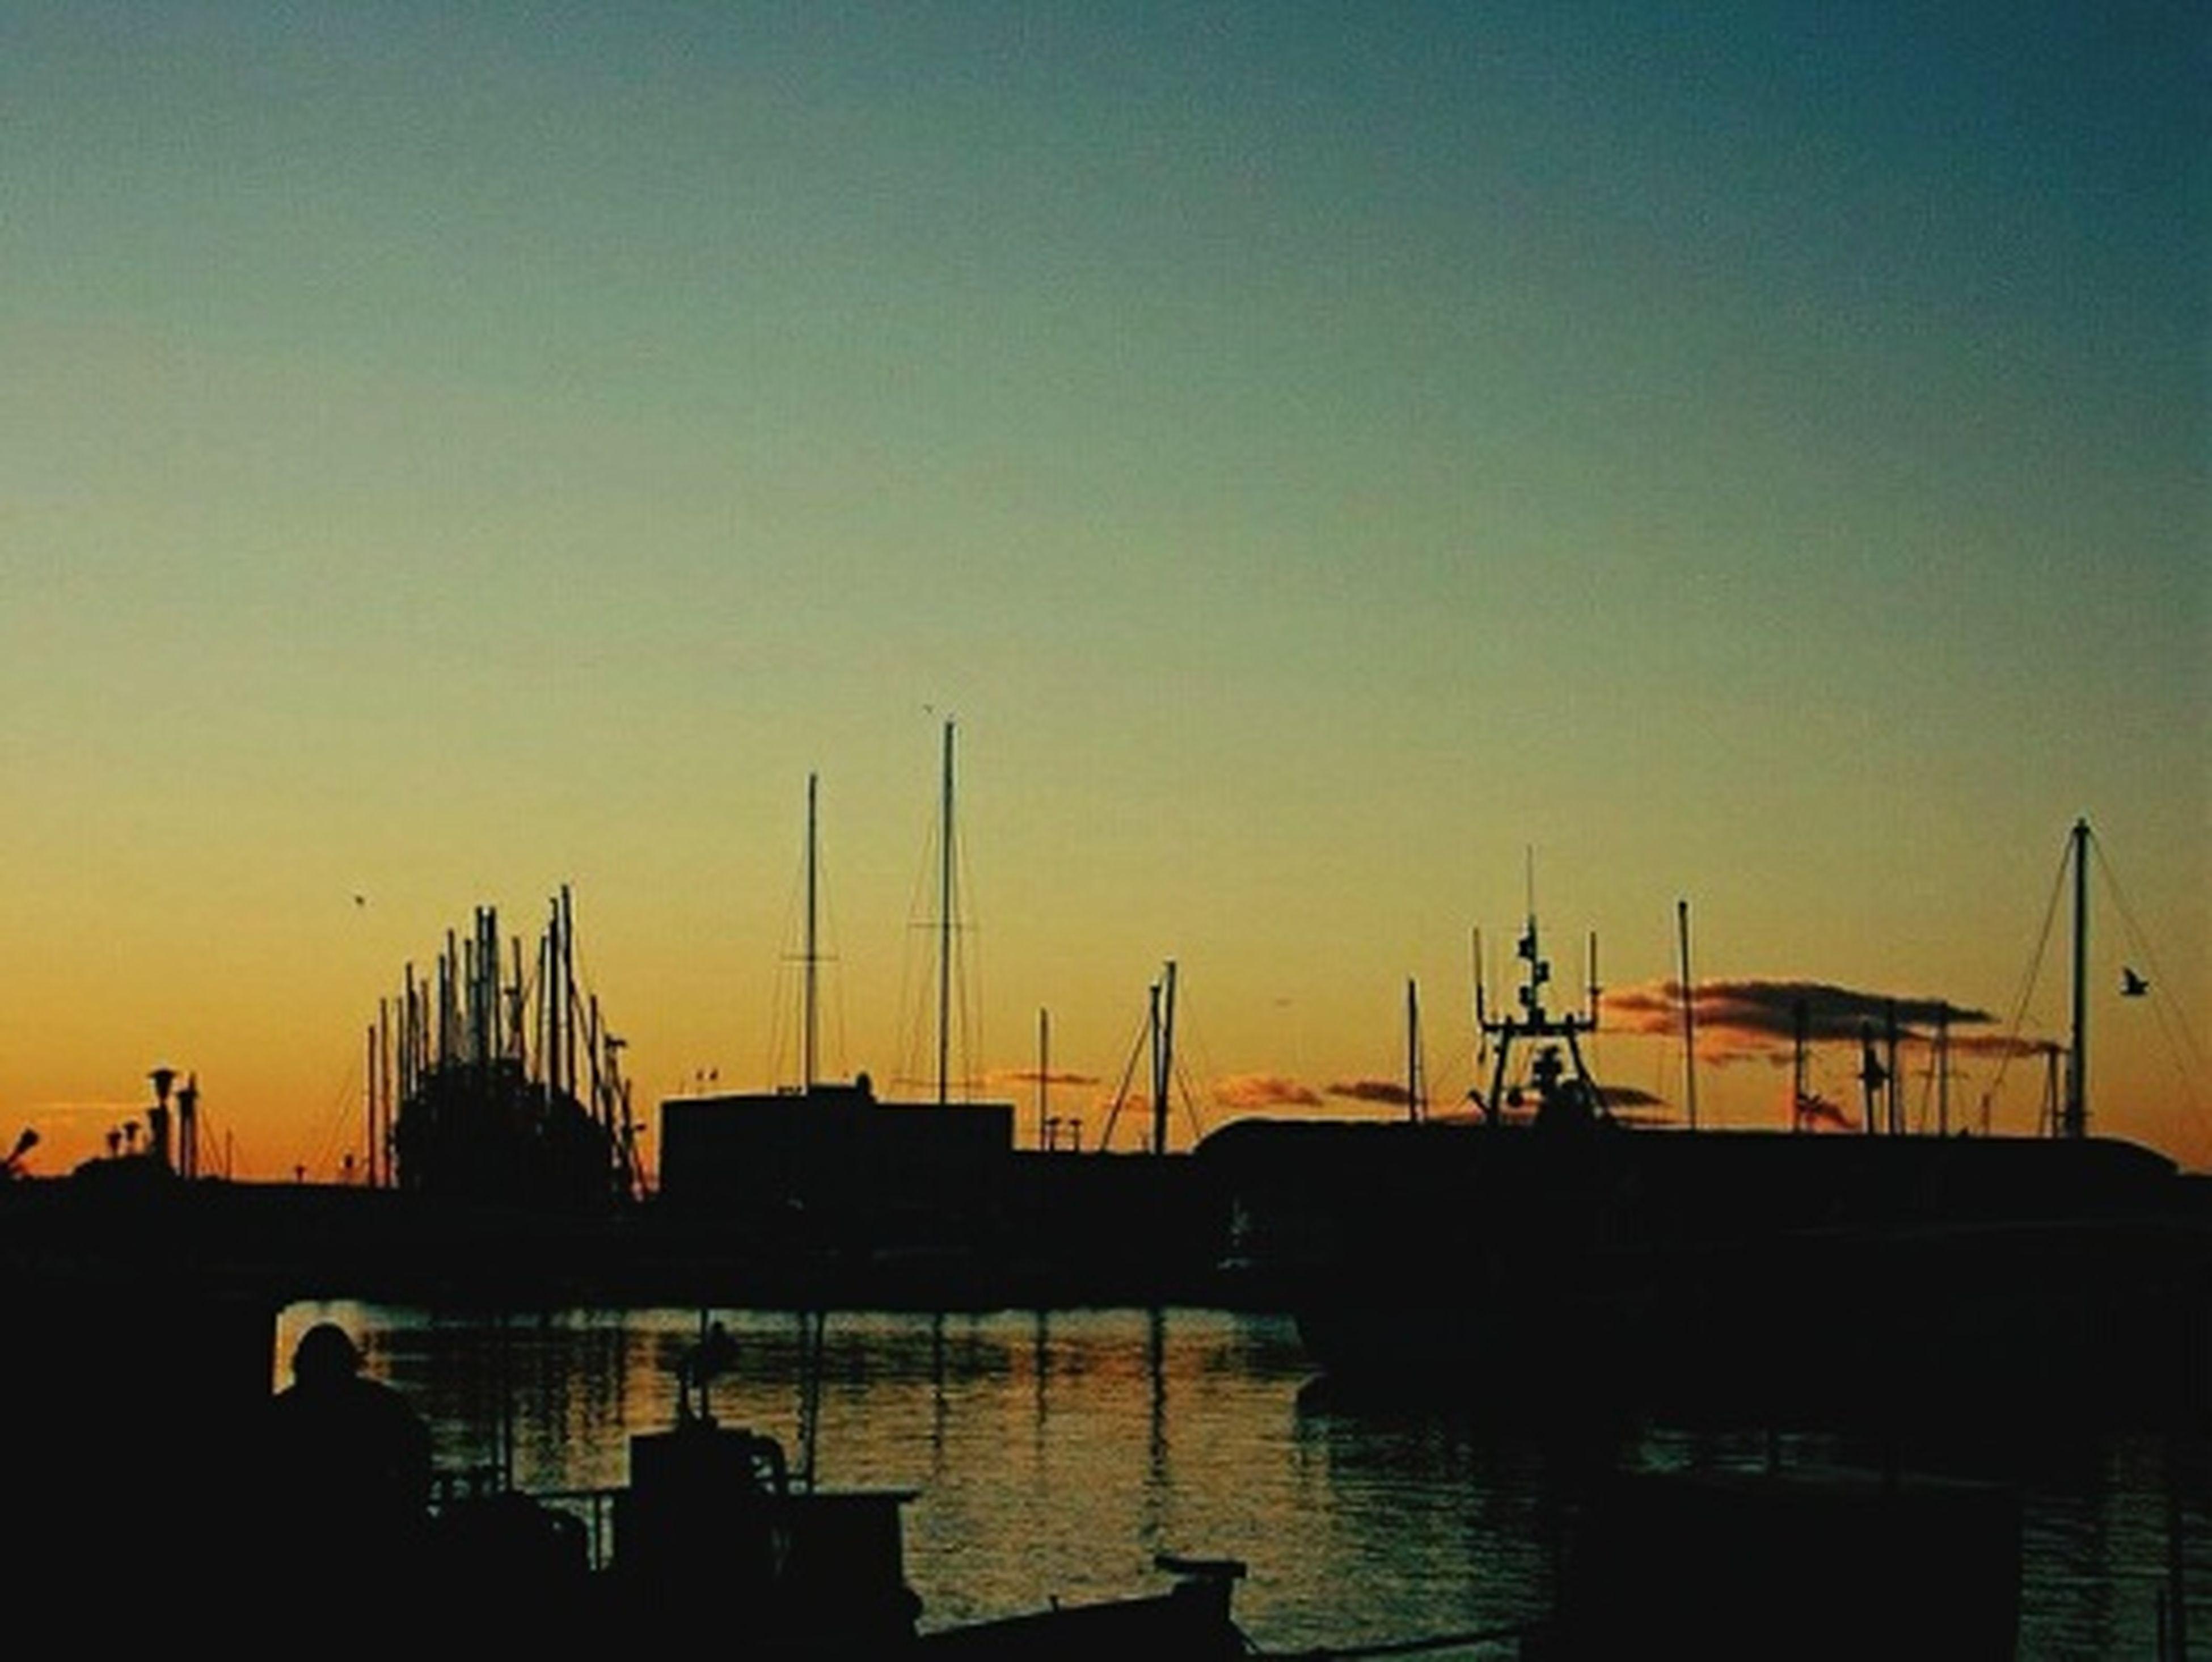 sunset, crane - construction machinery, harbor, crane, built structure, silhouette, architecture, building exterior, commercial dock, water, development, orange color, nautical vessel, industry, construction site, copy space, waterfront, clear sky, sky, construction